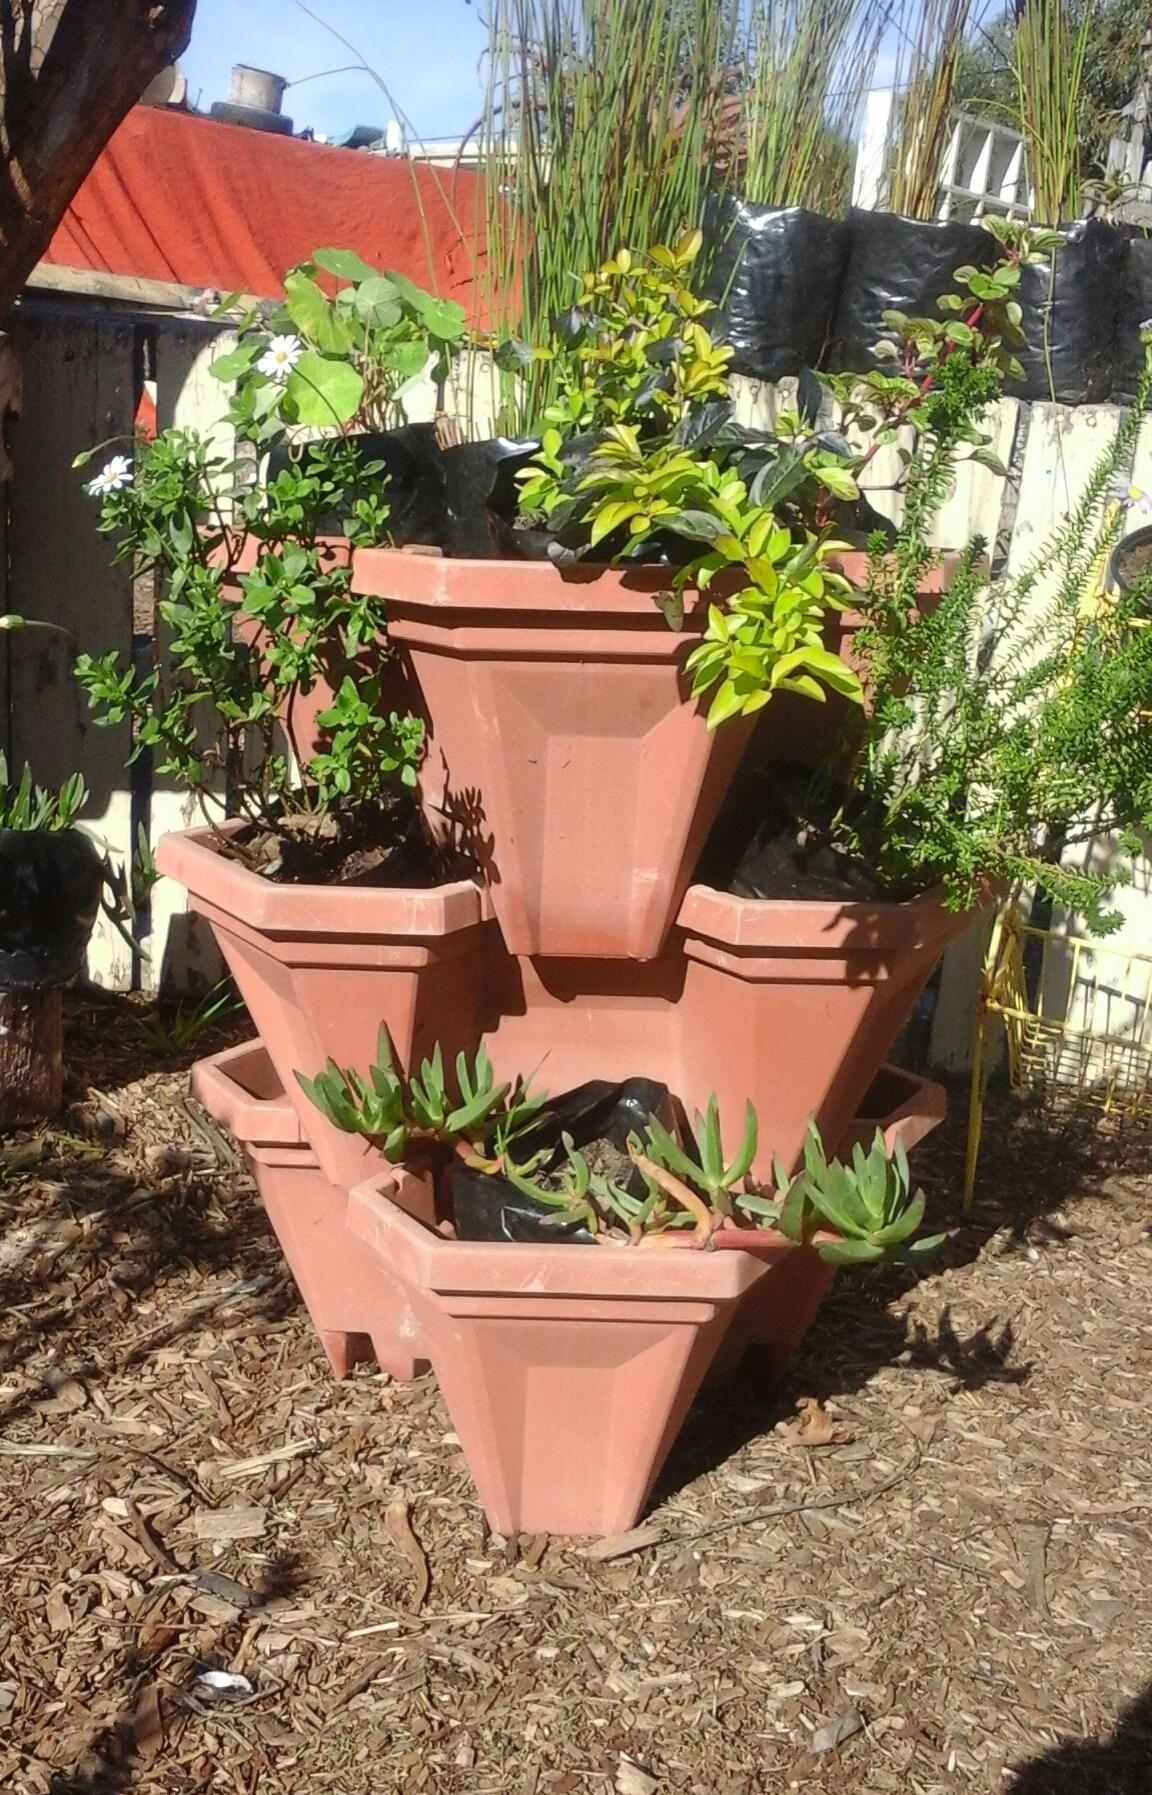 3 Tier Garden Pot